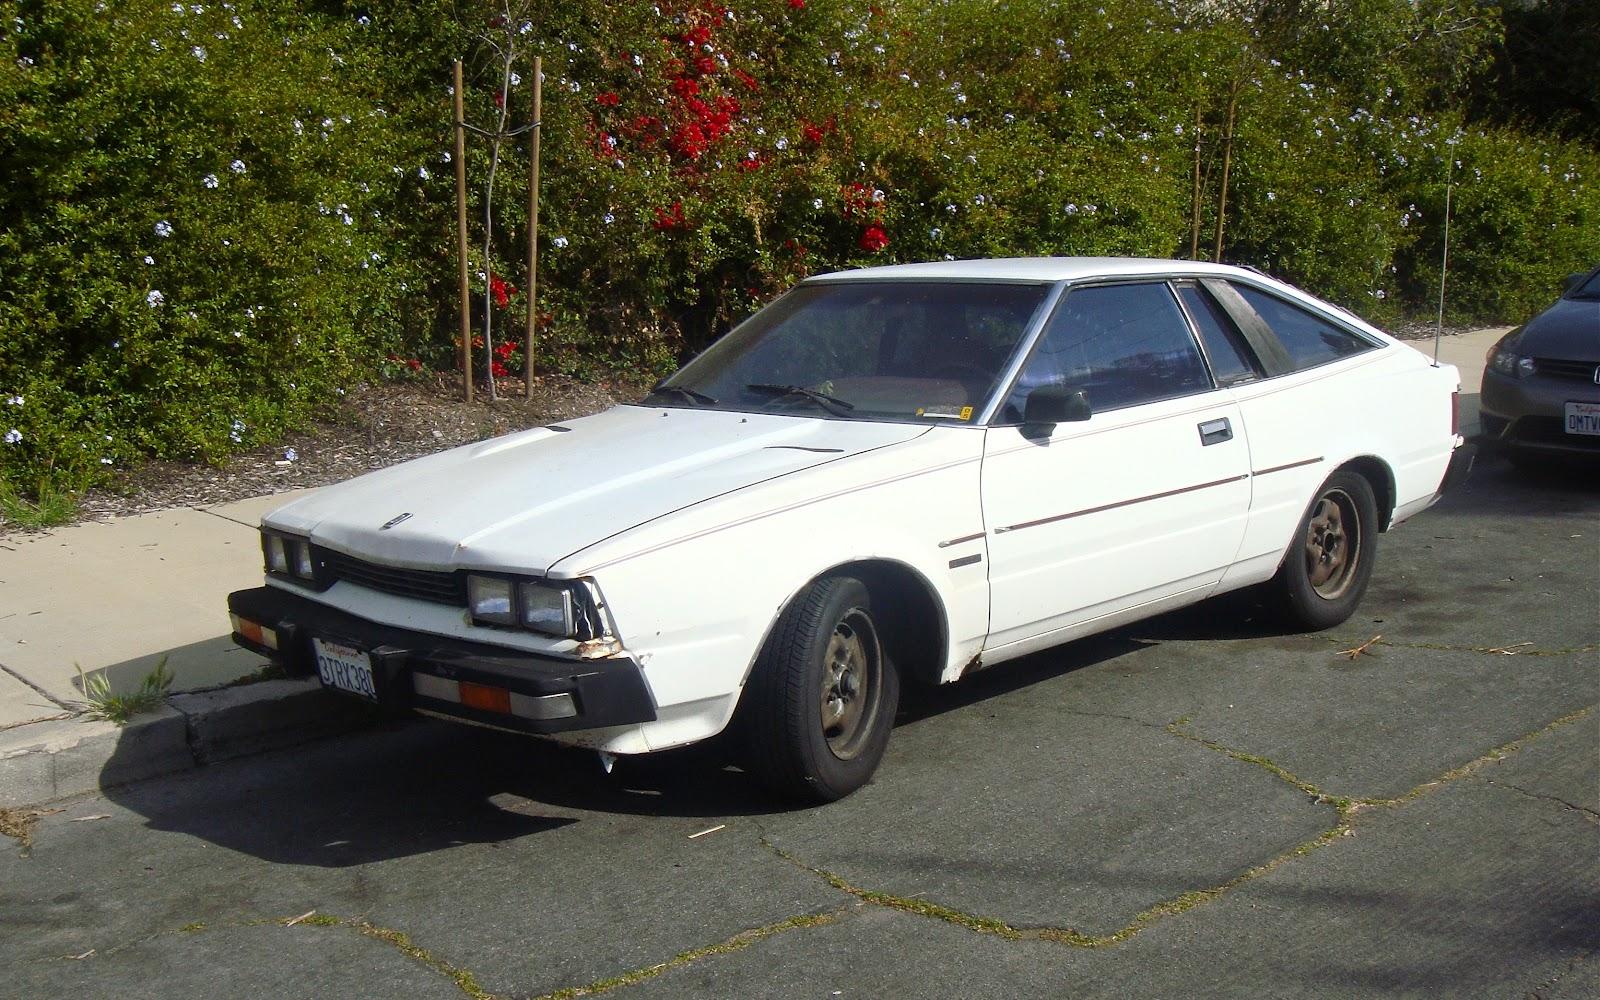 Nissan San Diego >> THE STREET PEEP: 1980 Datsun 200SX Hatchback